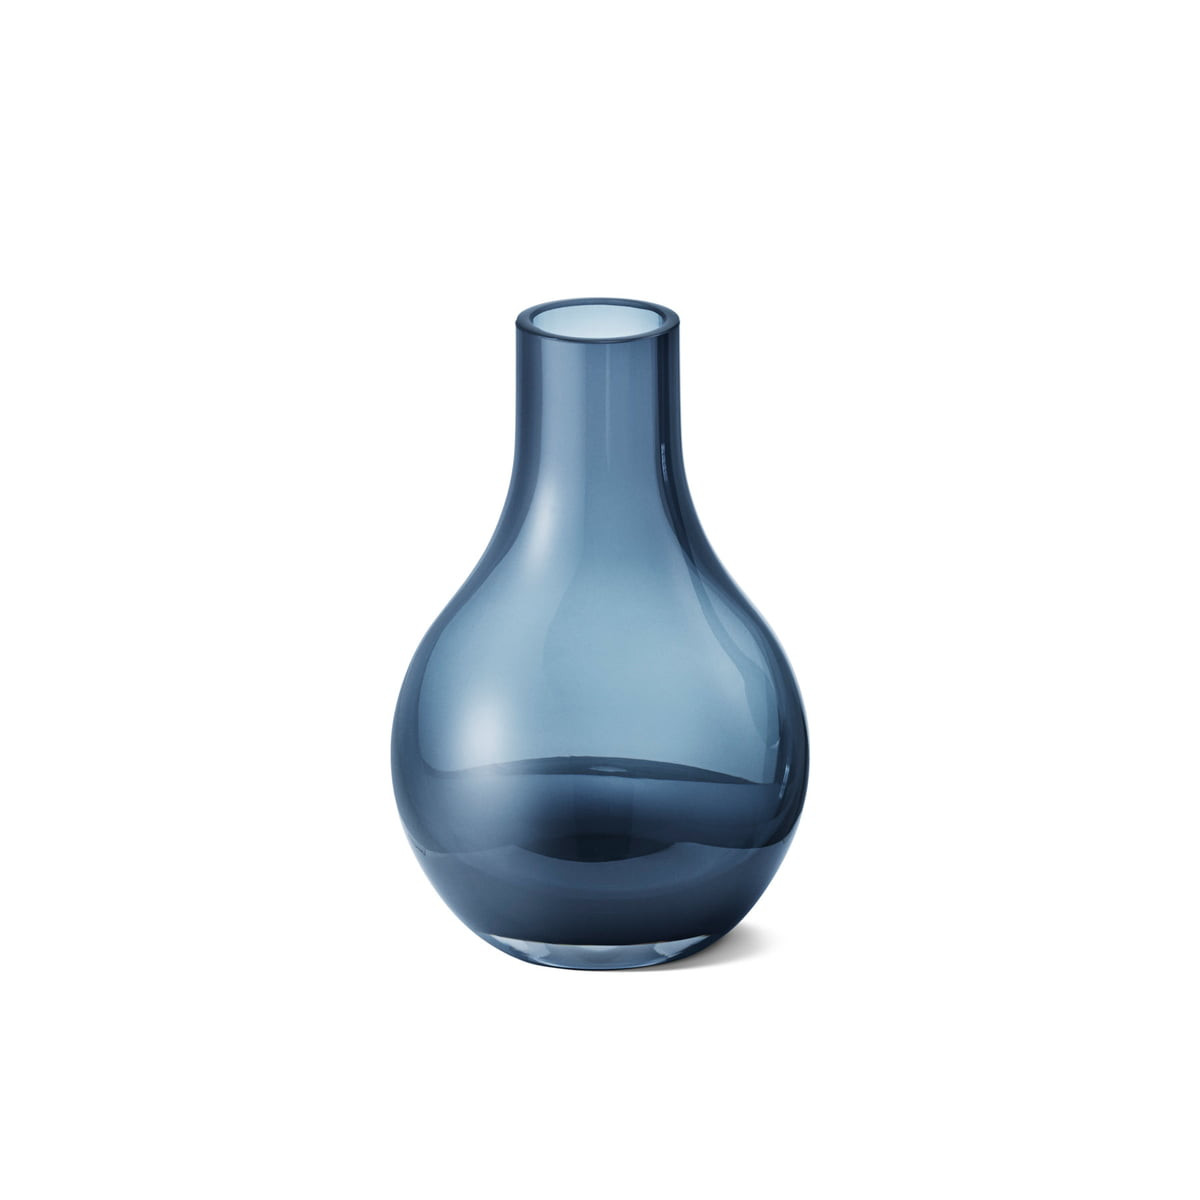 26 Famous Georg Jensen Cafu Vase